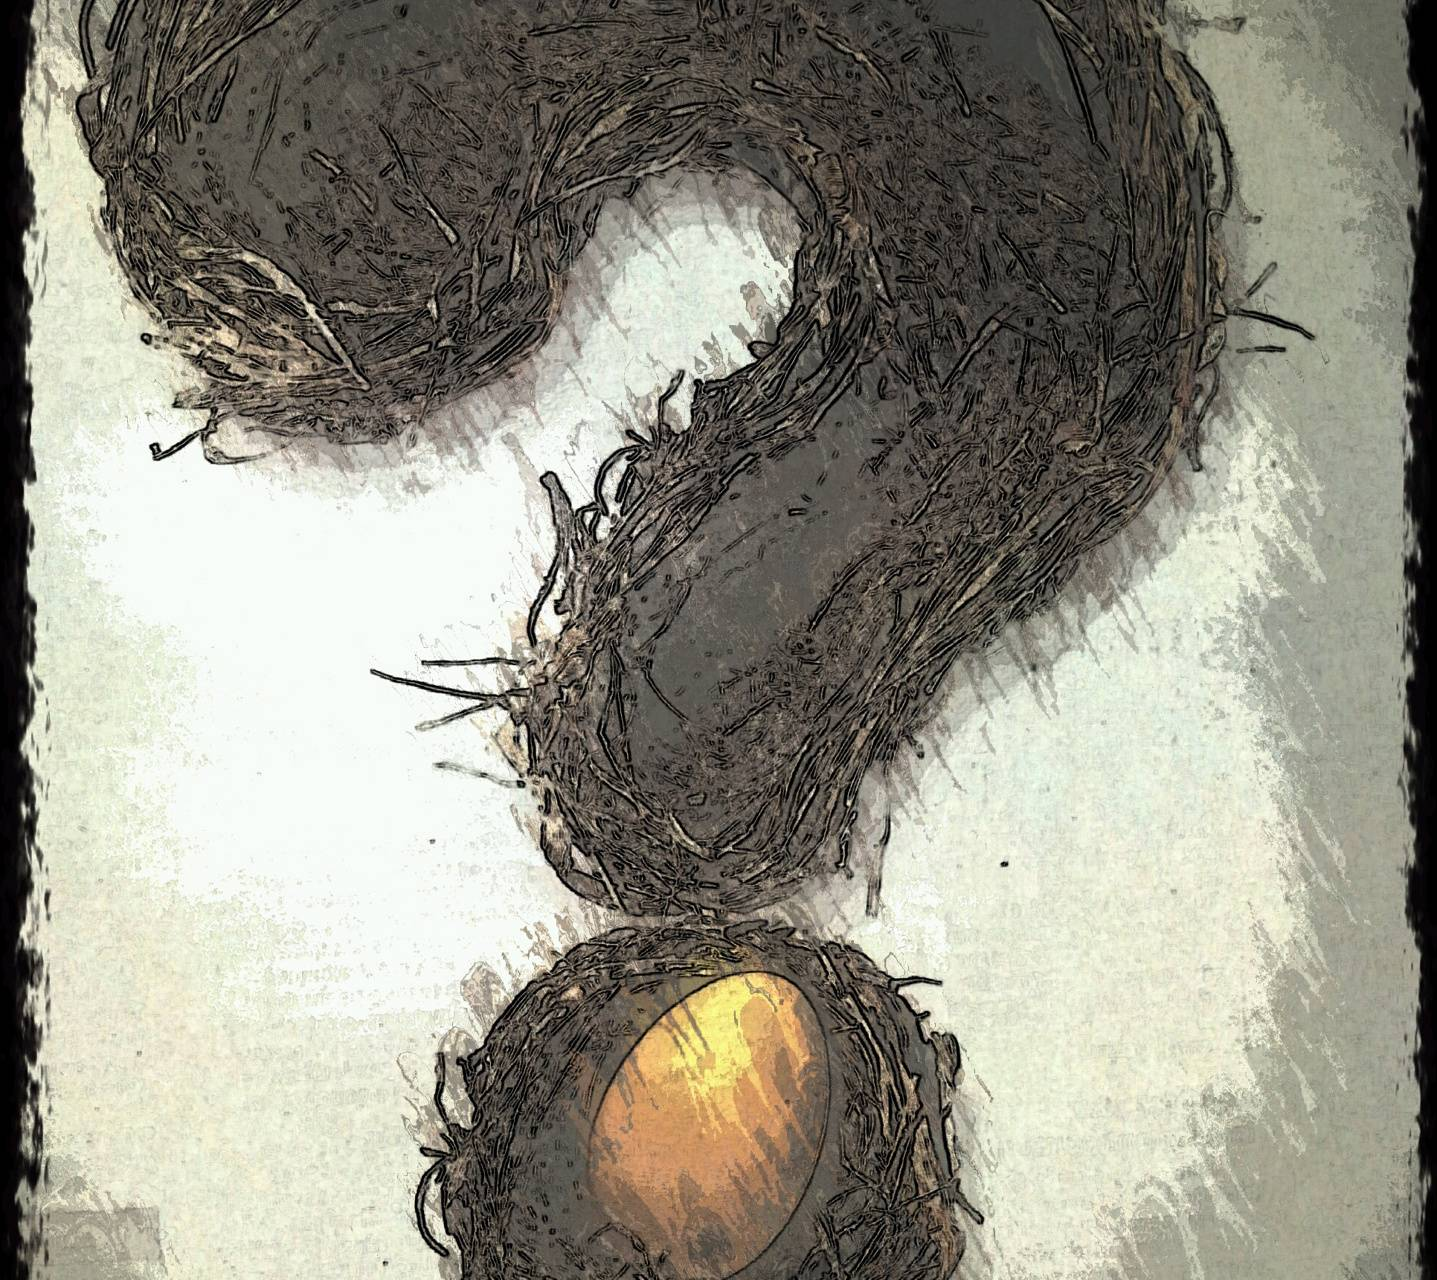 Question Egg hash